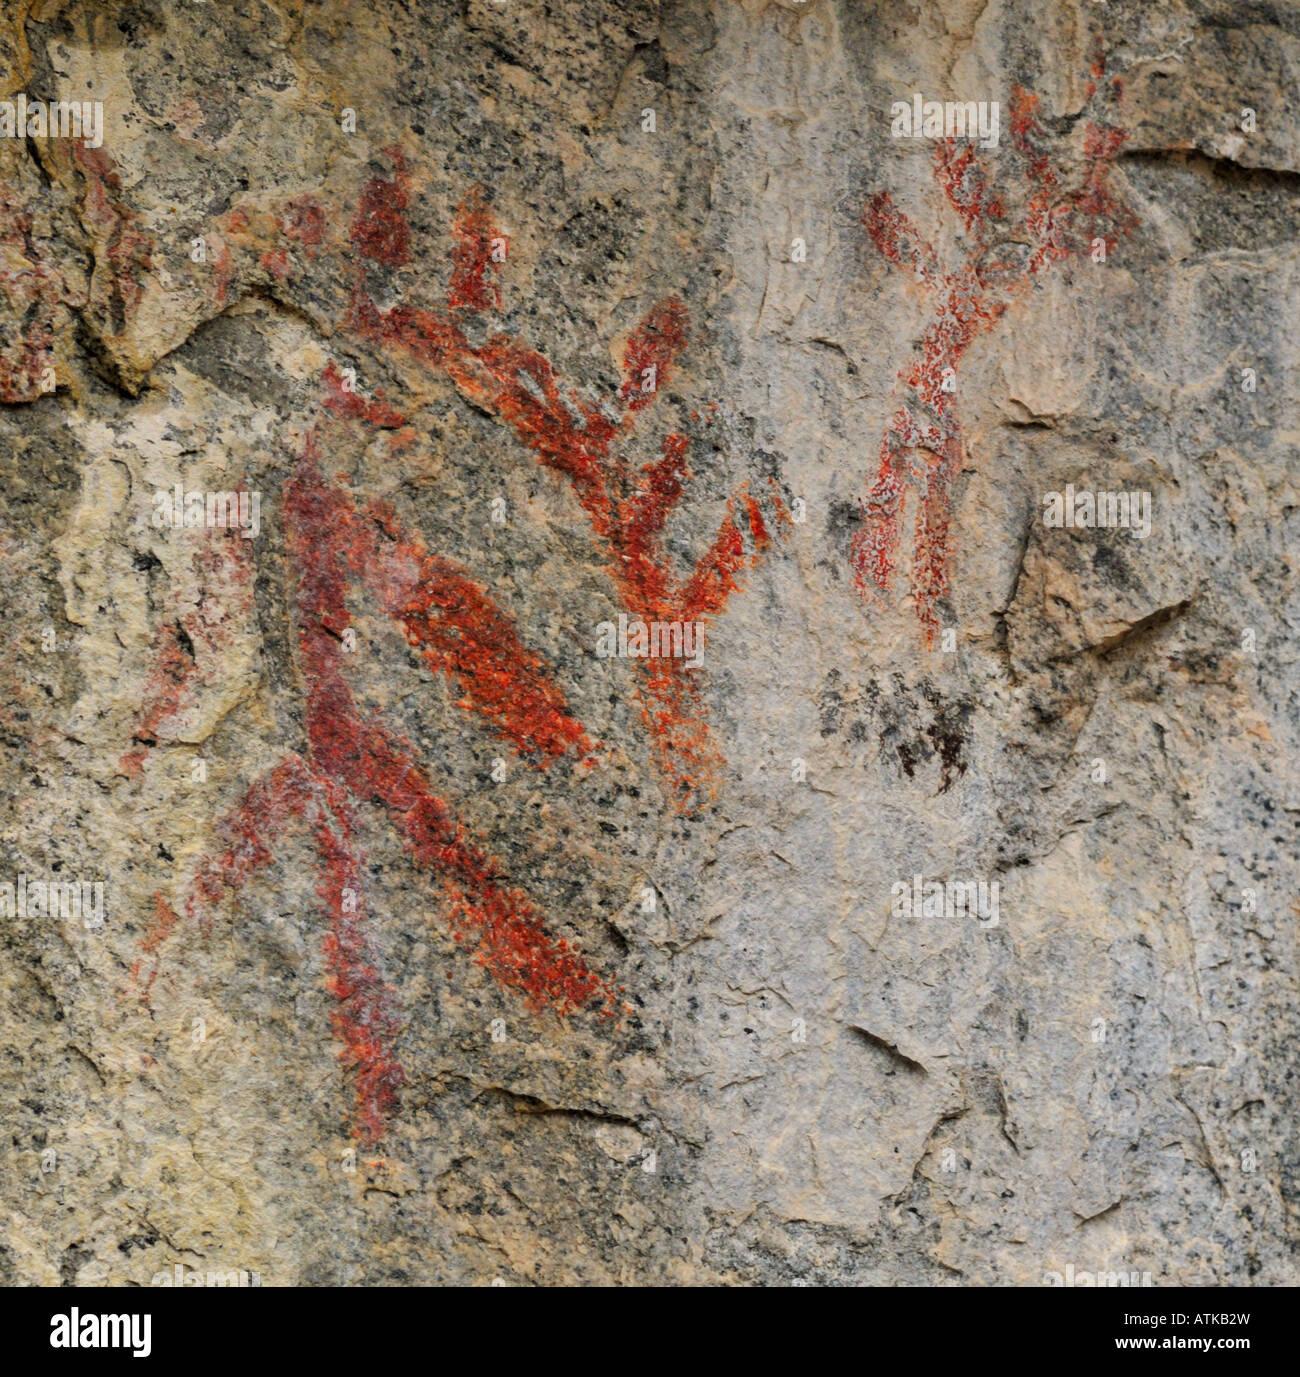 Kenneth Wyatt Photography - Southwest - pictograph, Utah, rock art